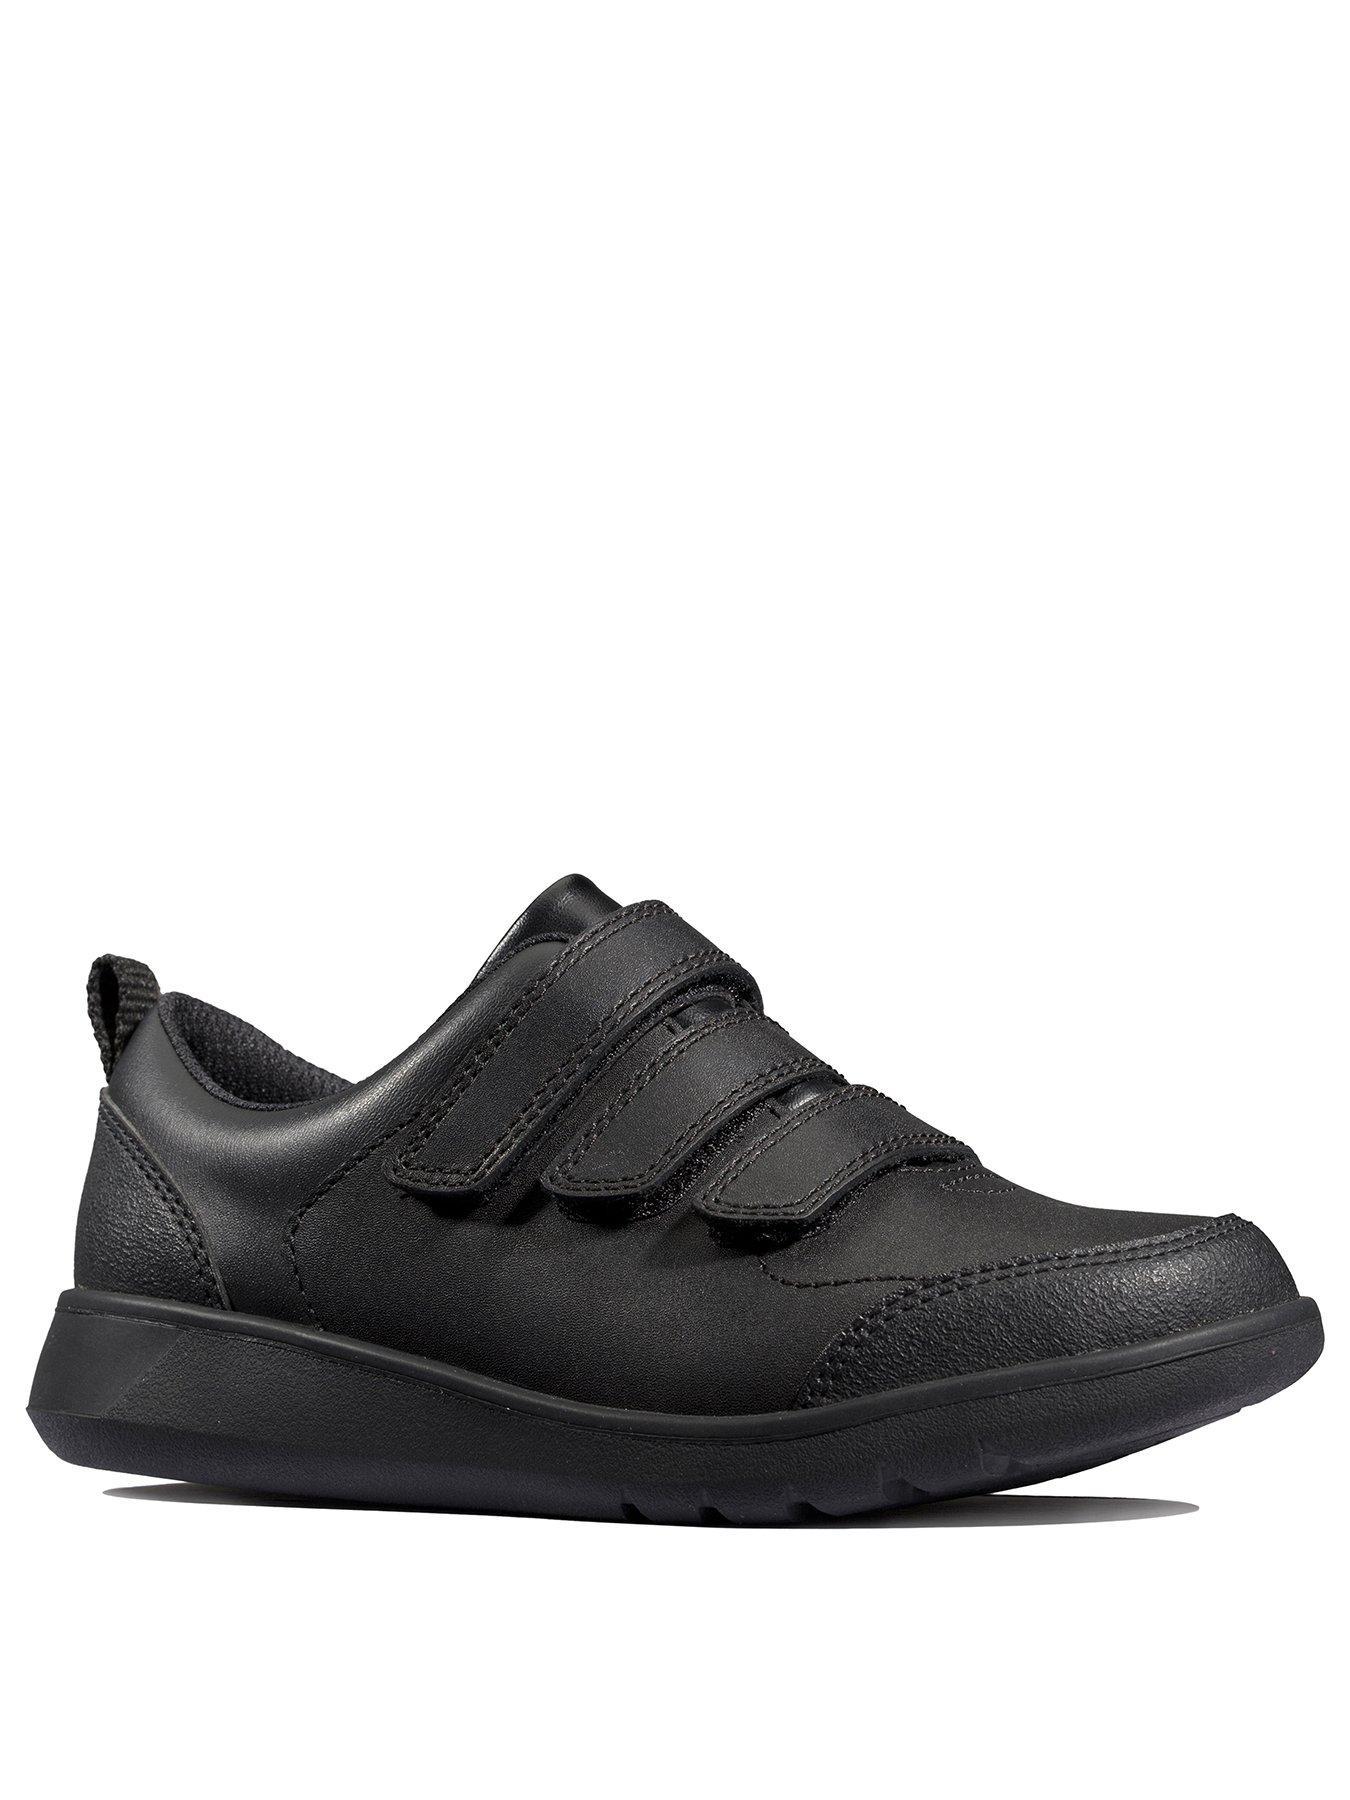 Boys Clarks Blake Street Black Leather Double Strap School Shoes